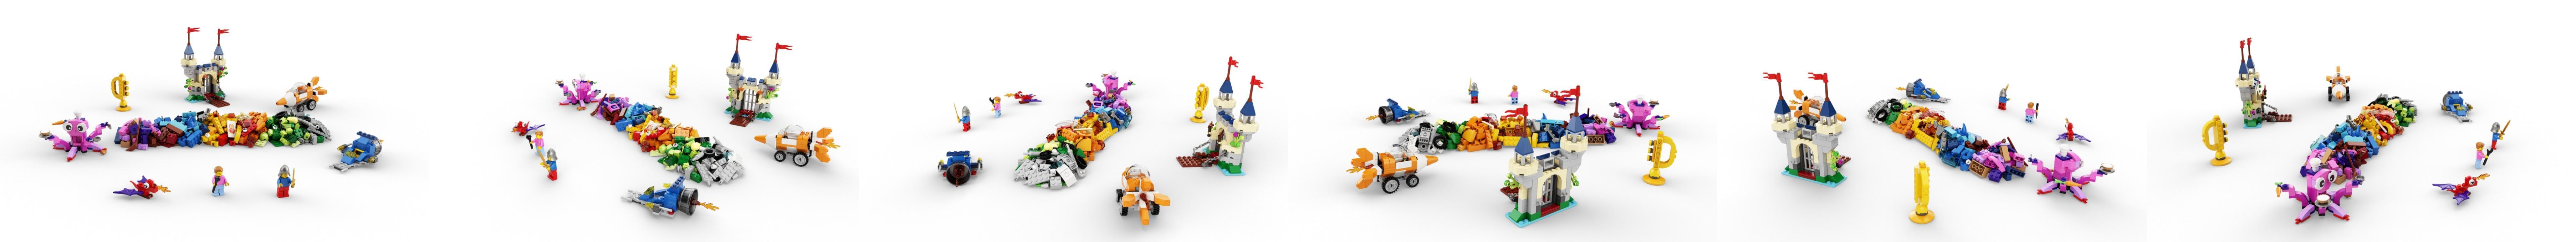 Lego Pierre arrondi 1x4x0,6 New marron 4 Pièce 227